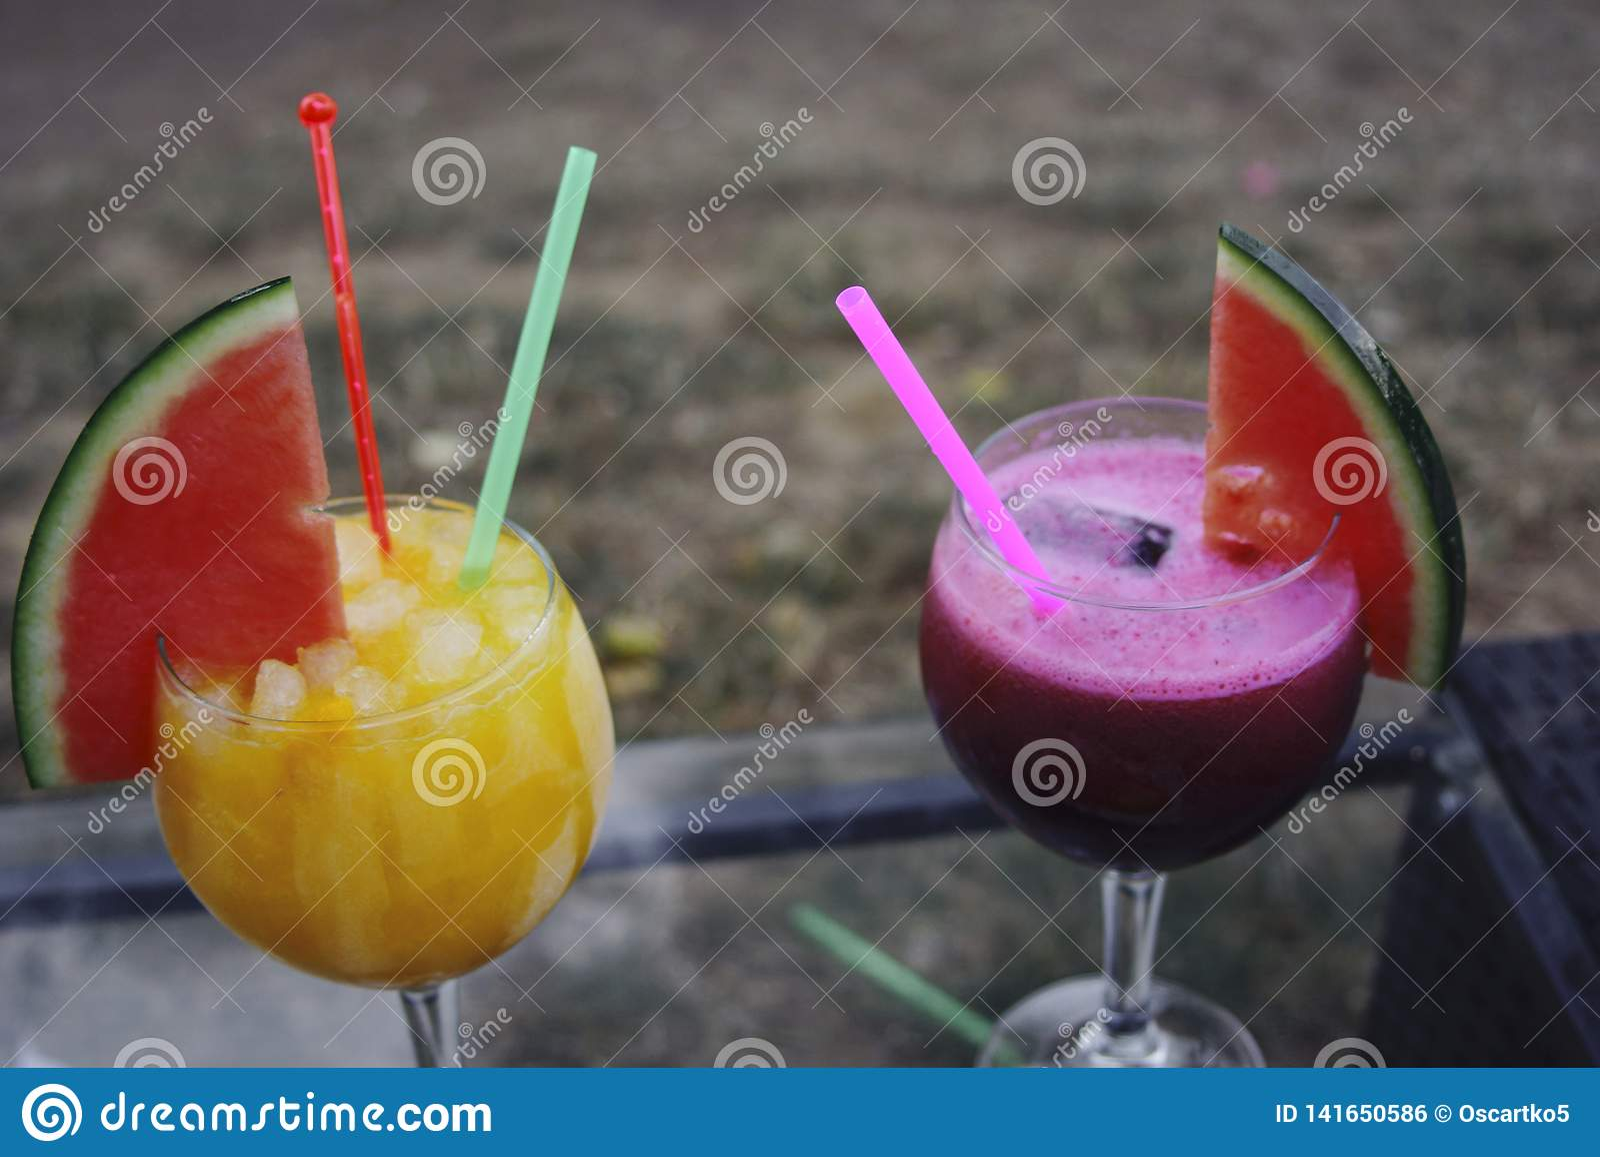 Cocktails in summer